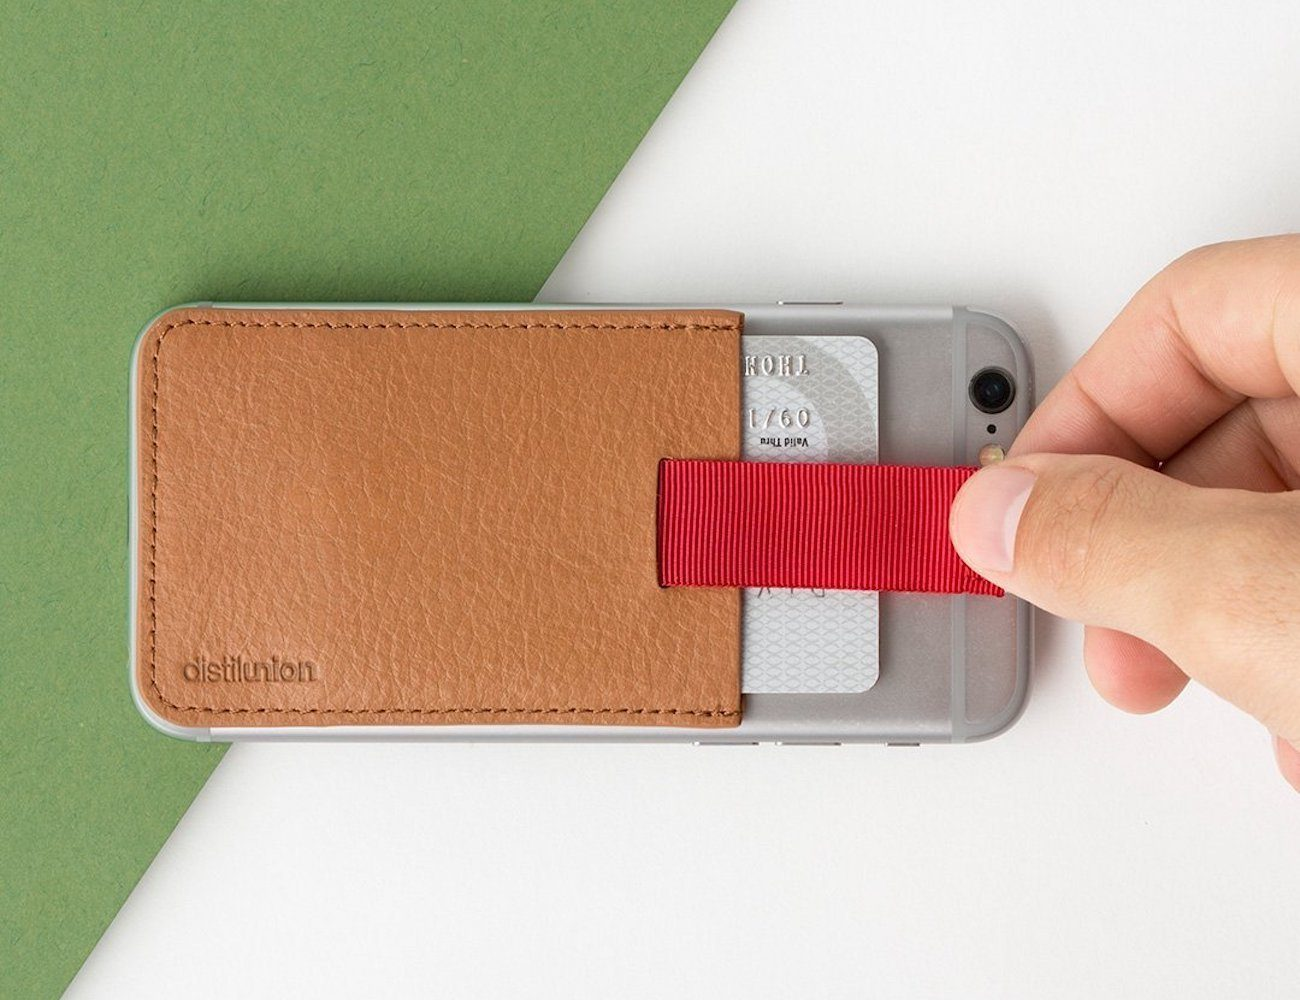 Wally Junior Slim Smartphone Card Holder